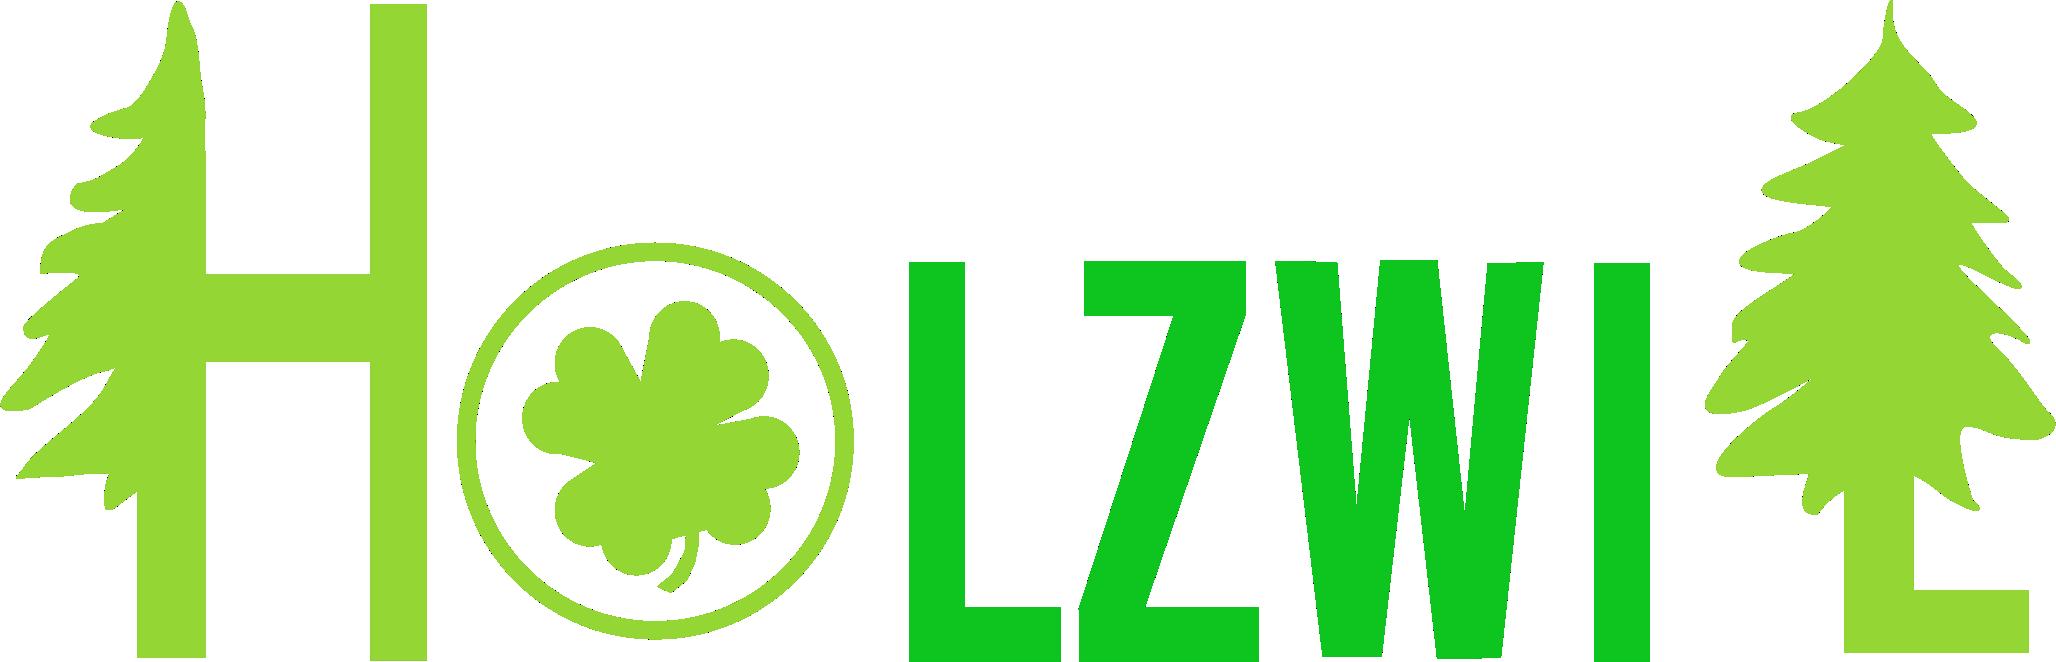 HOLZWIL